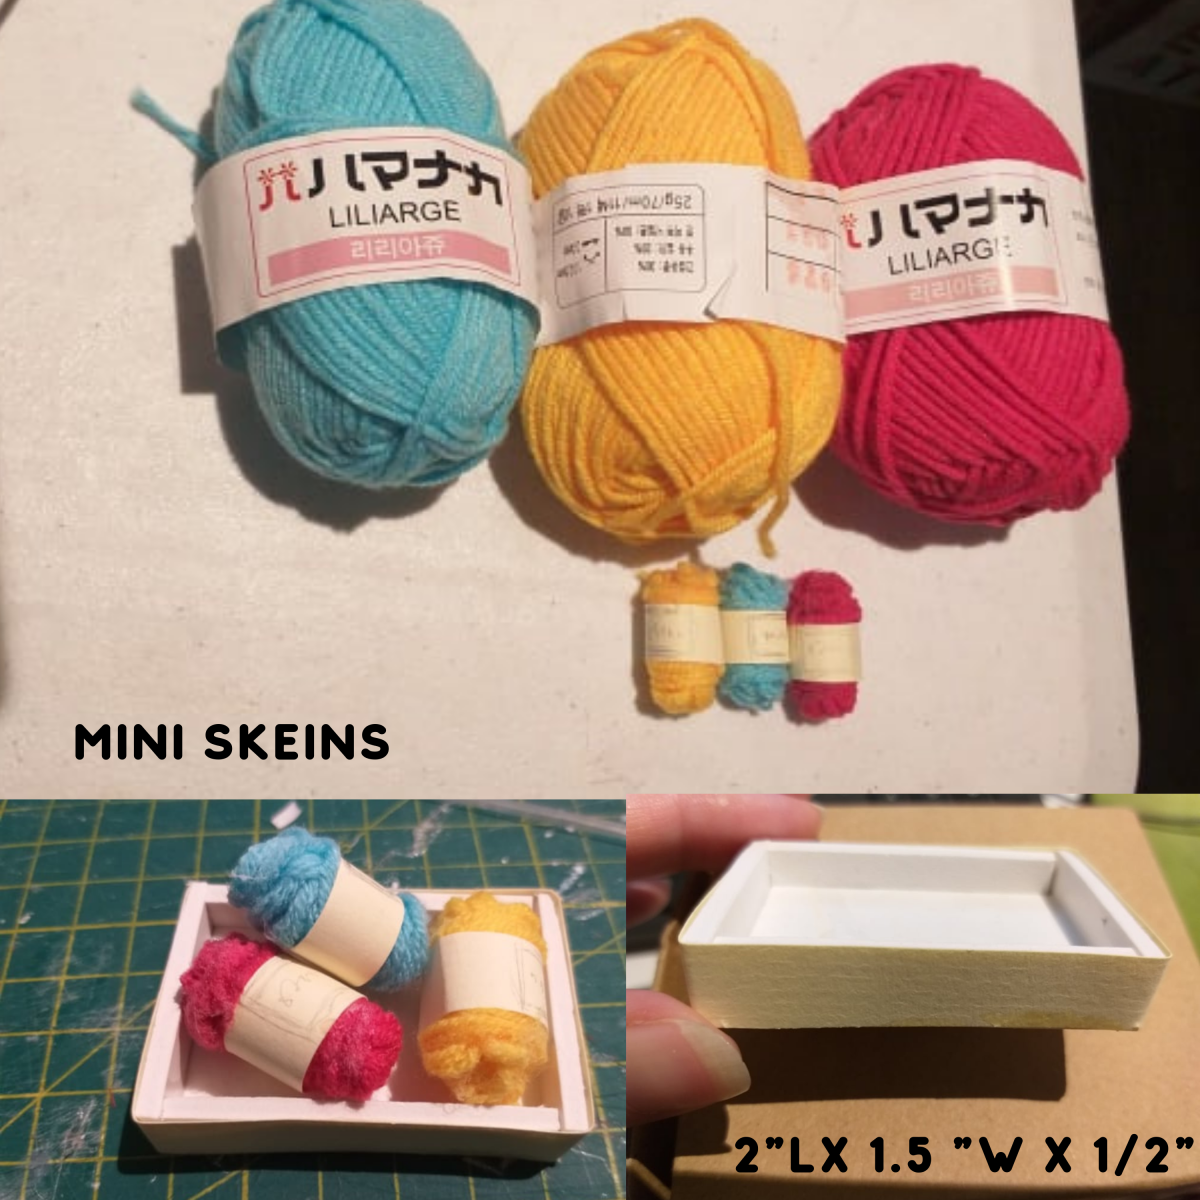 Mini skeins of yarn.